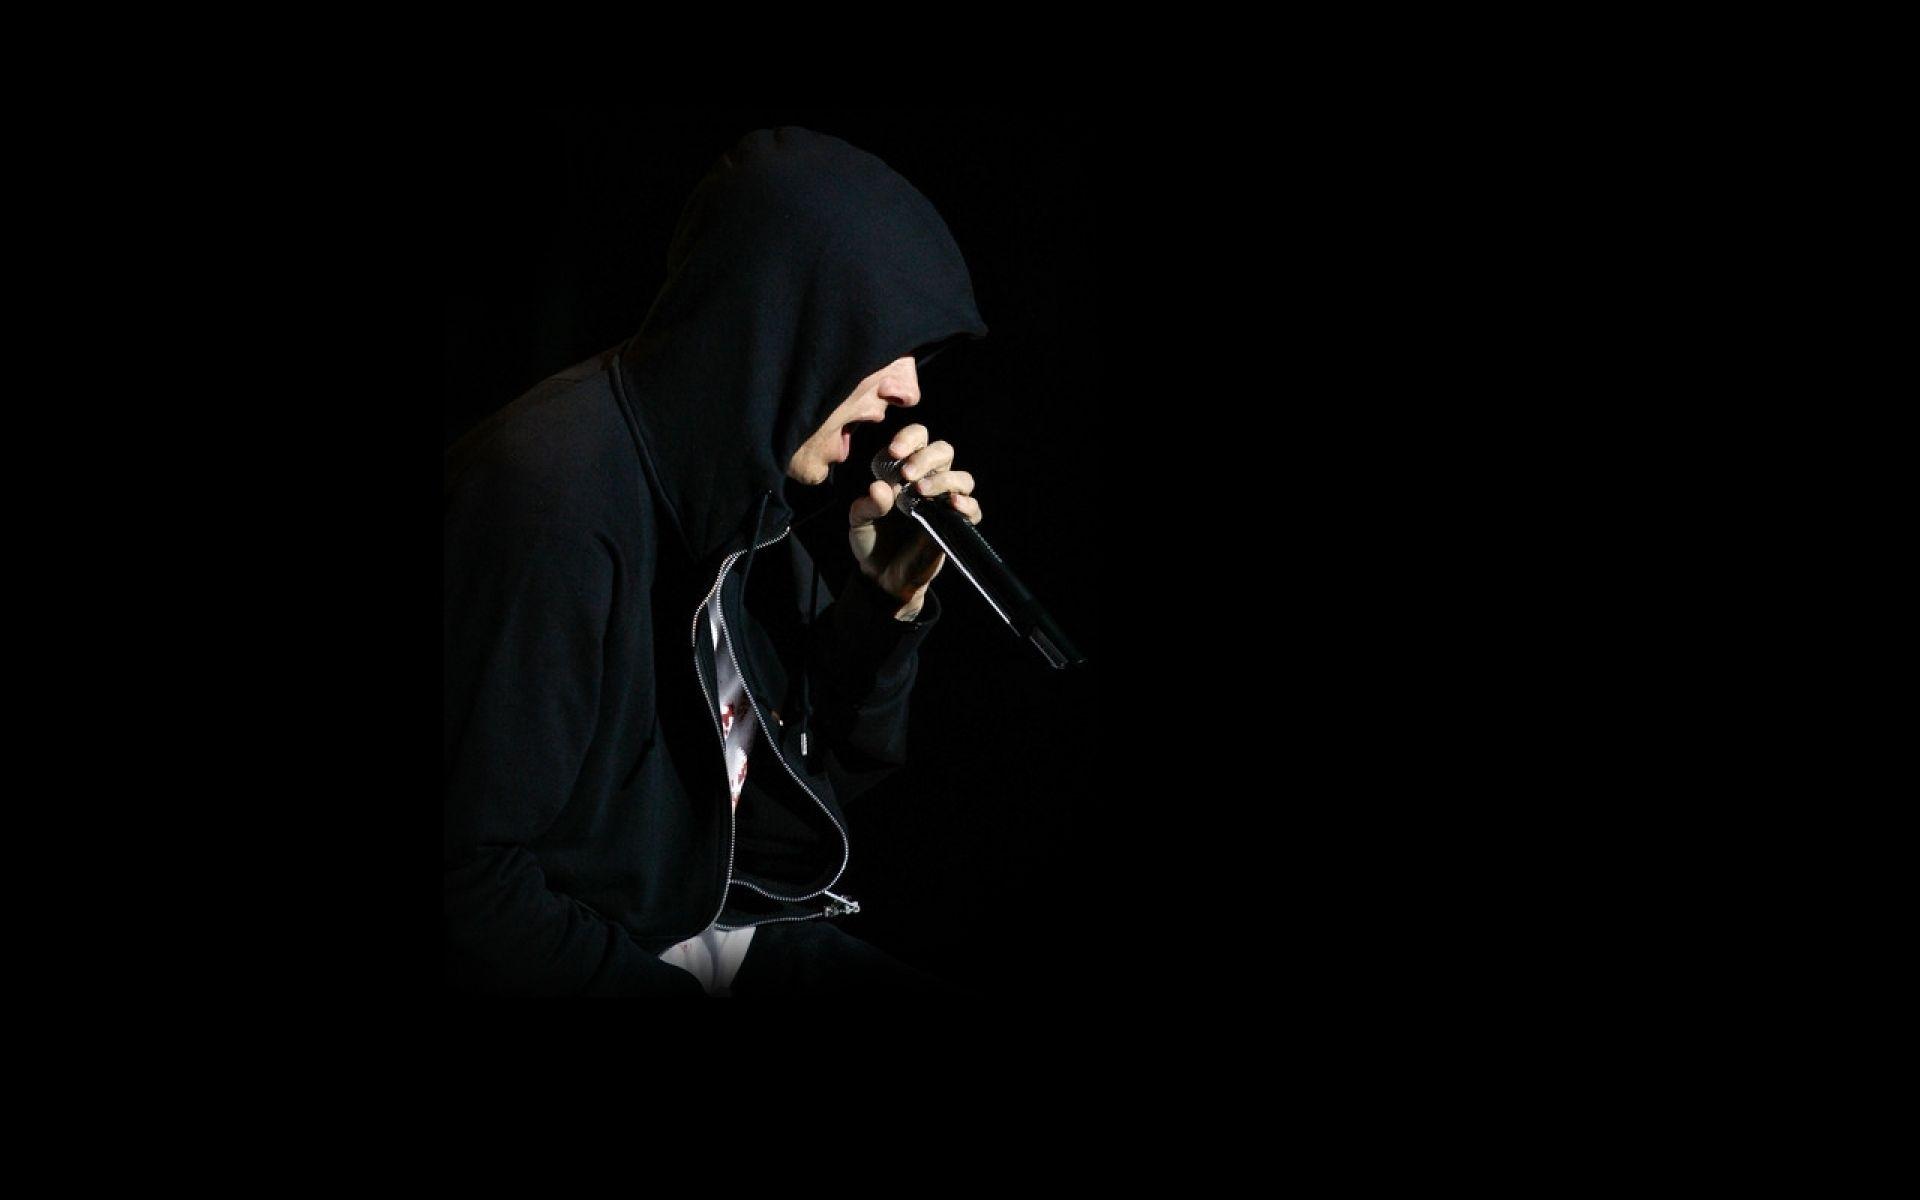 Eminem Wallpaper Hd wallpaper EminemRap god in 2019 Eminem 1920x1200